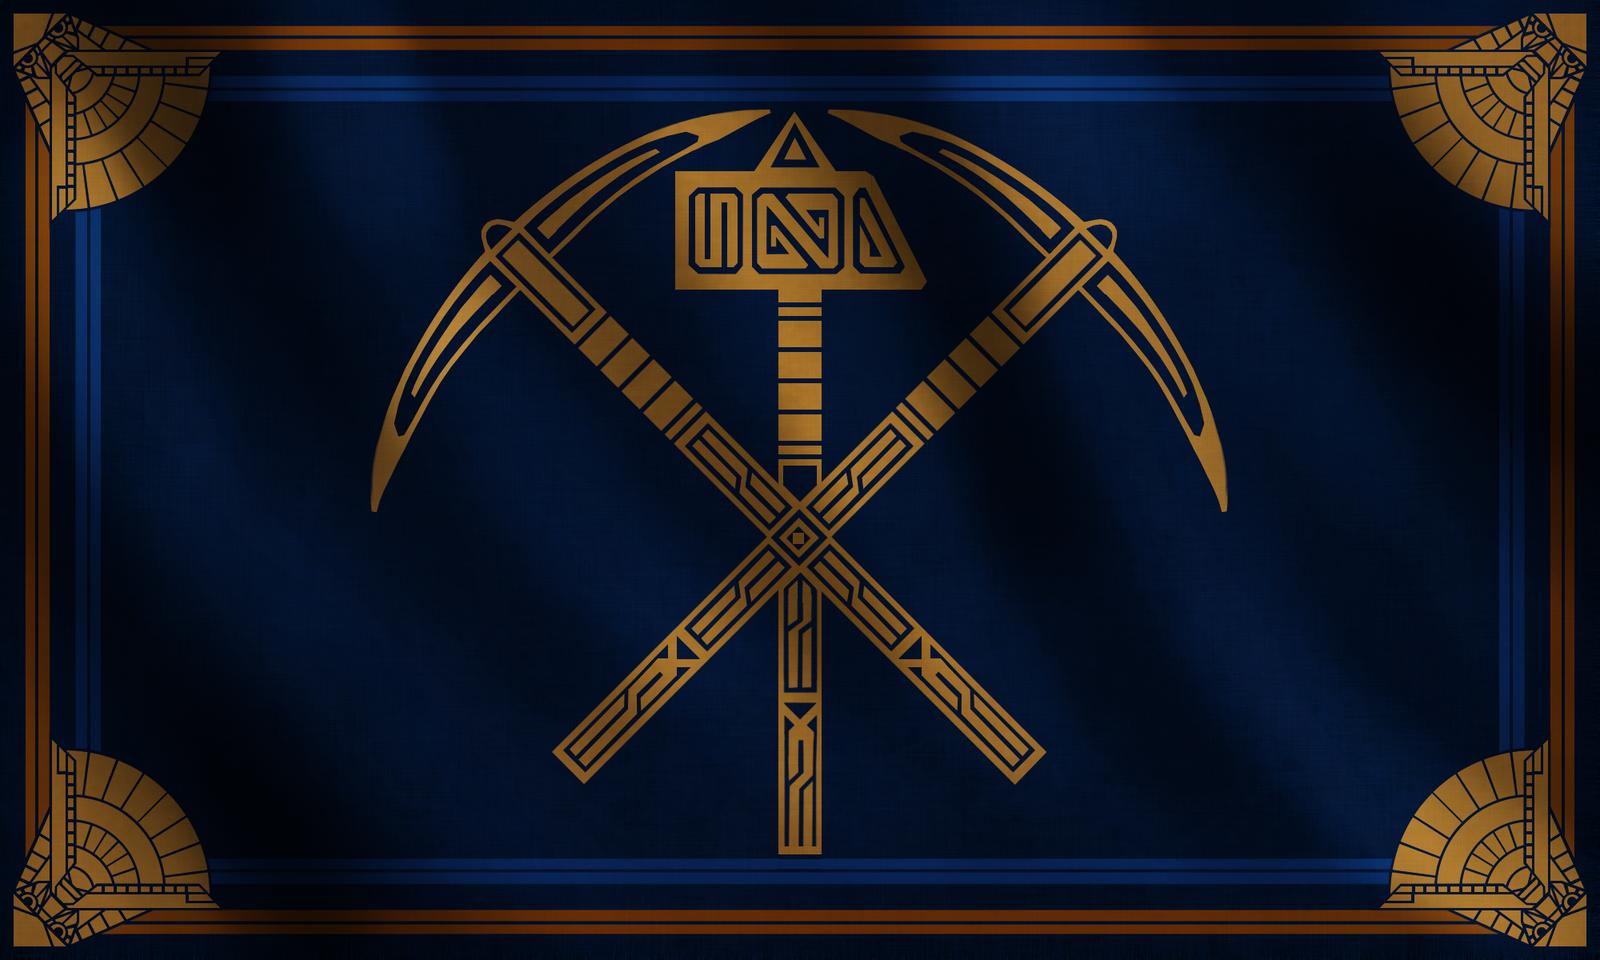 https://img00.deviantart.net/8665/i/2016/214/9/c/flag_of_the_dwarven_empire_by_aanker-dacc81f.png